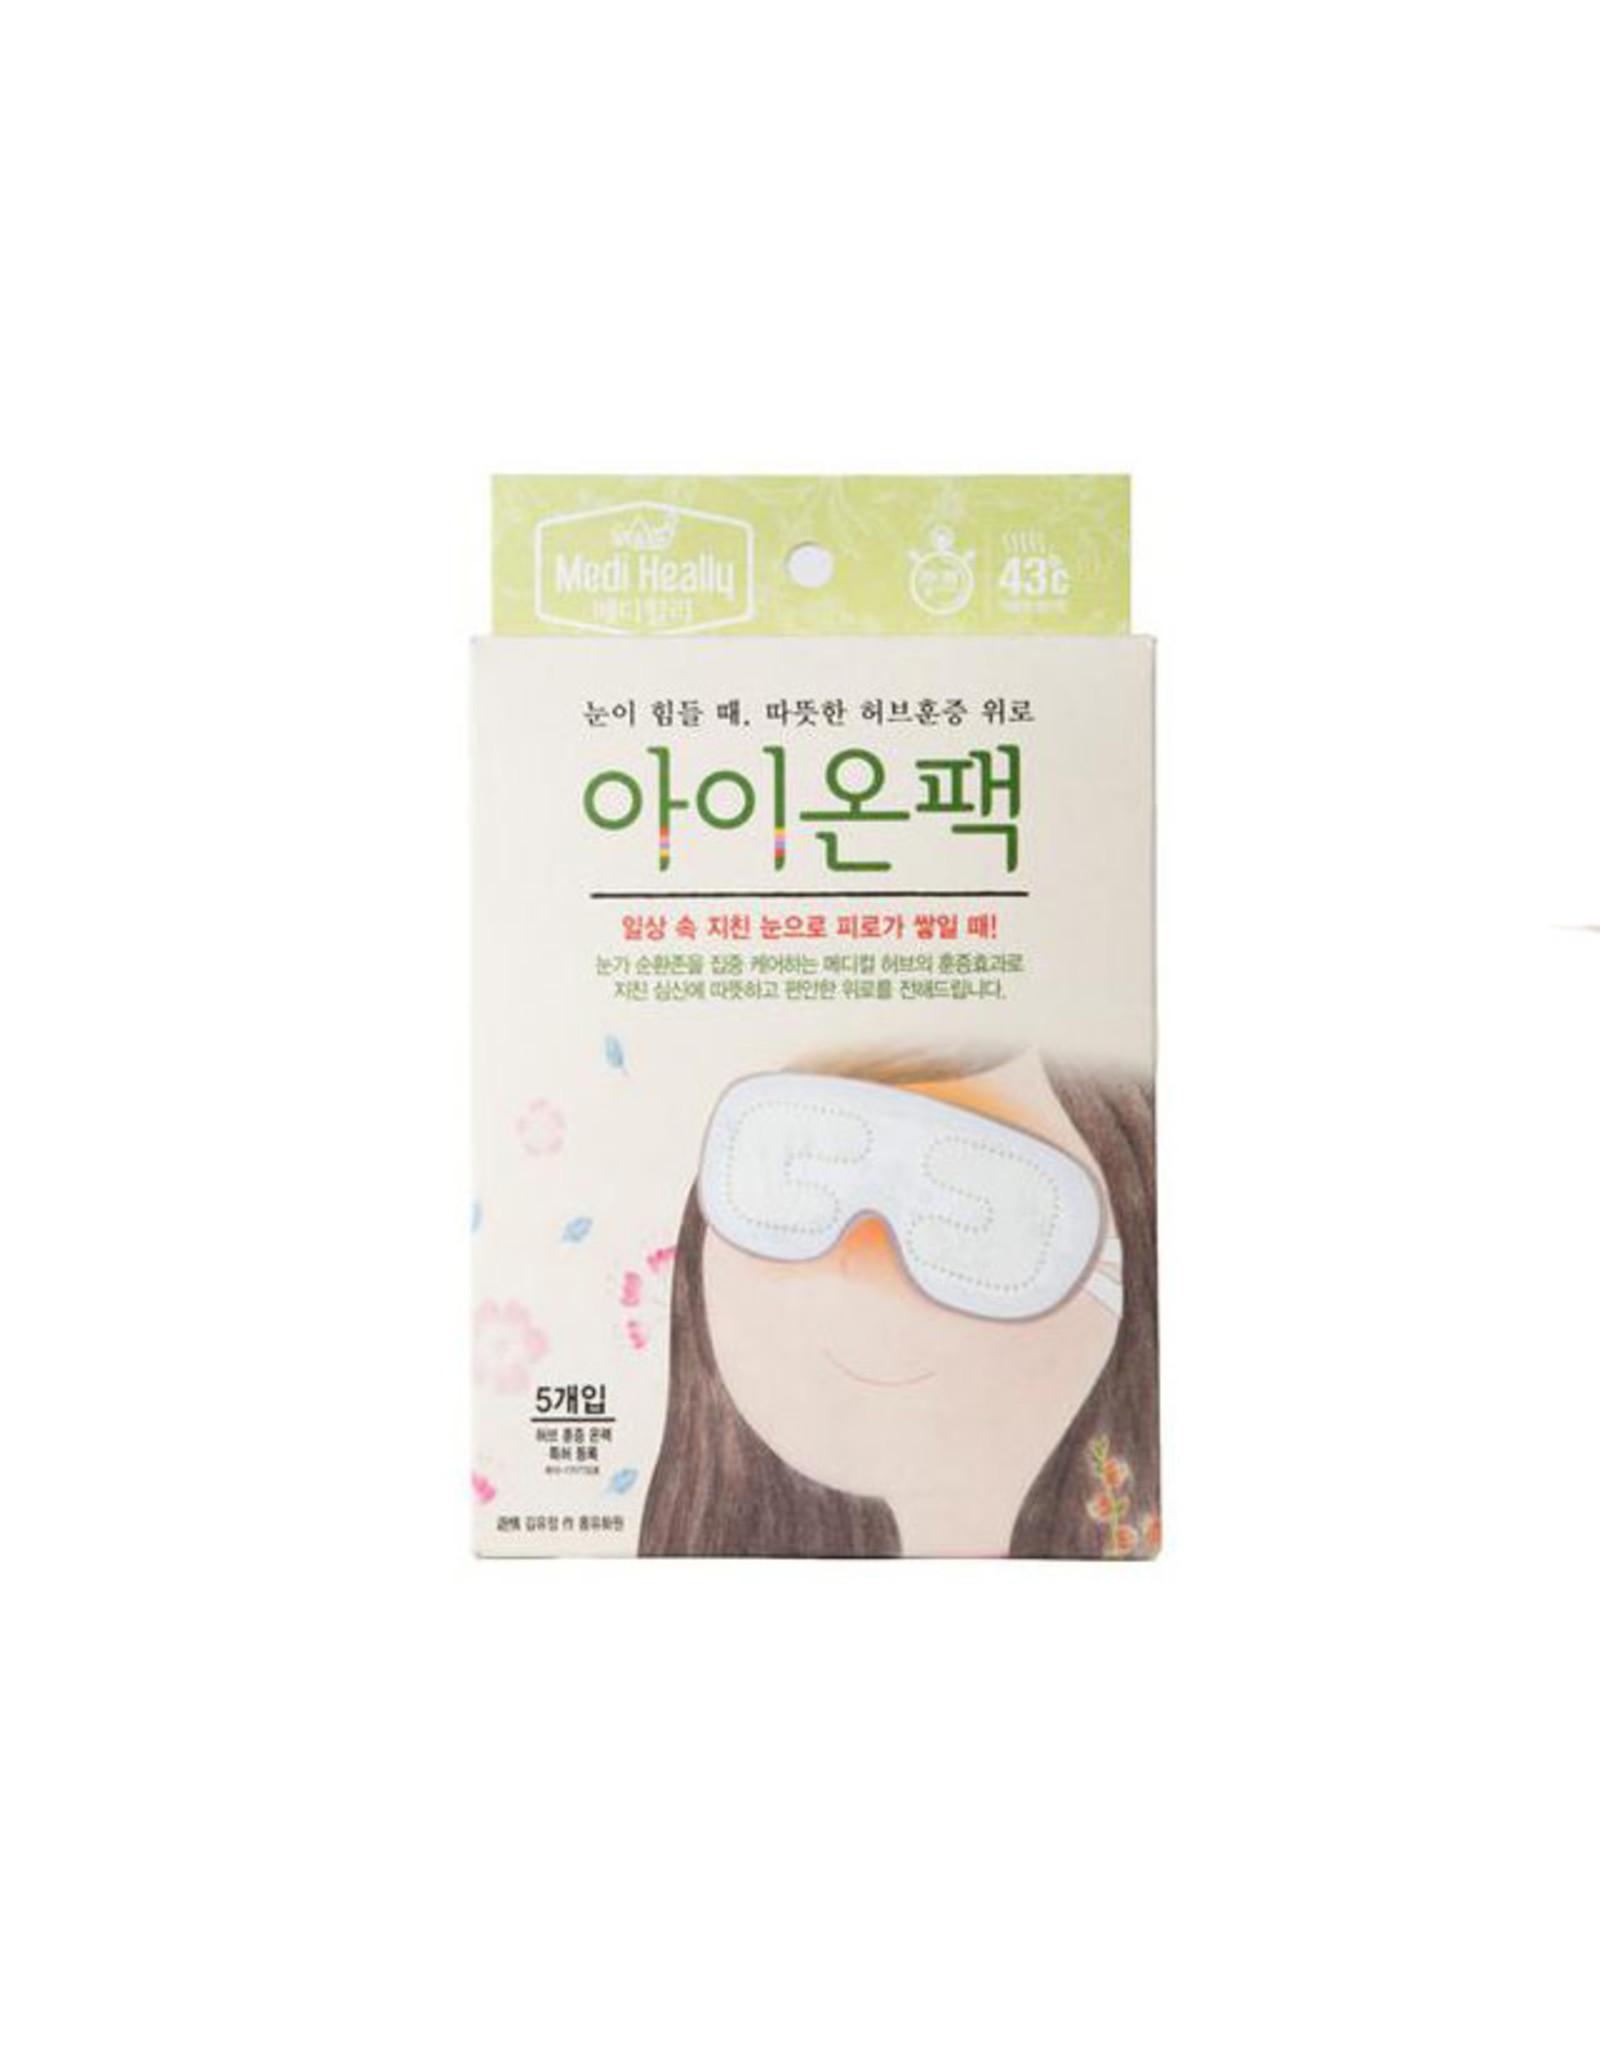 MediHeally MediHeally Eye-On Natural Herbal Gentle Warming Heating Steaming Hot Lavender Eye Mask Patch 5pcs